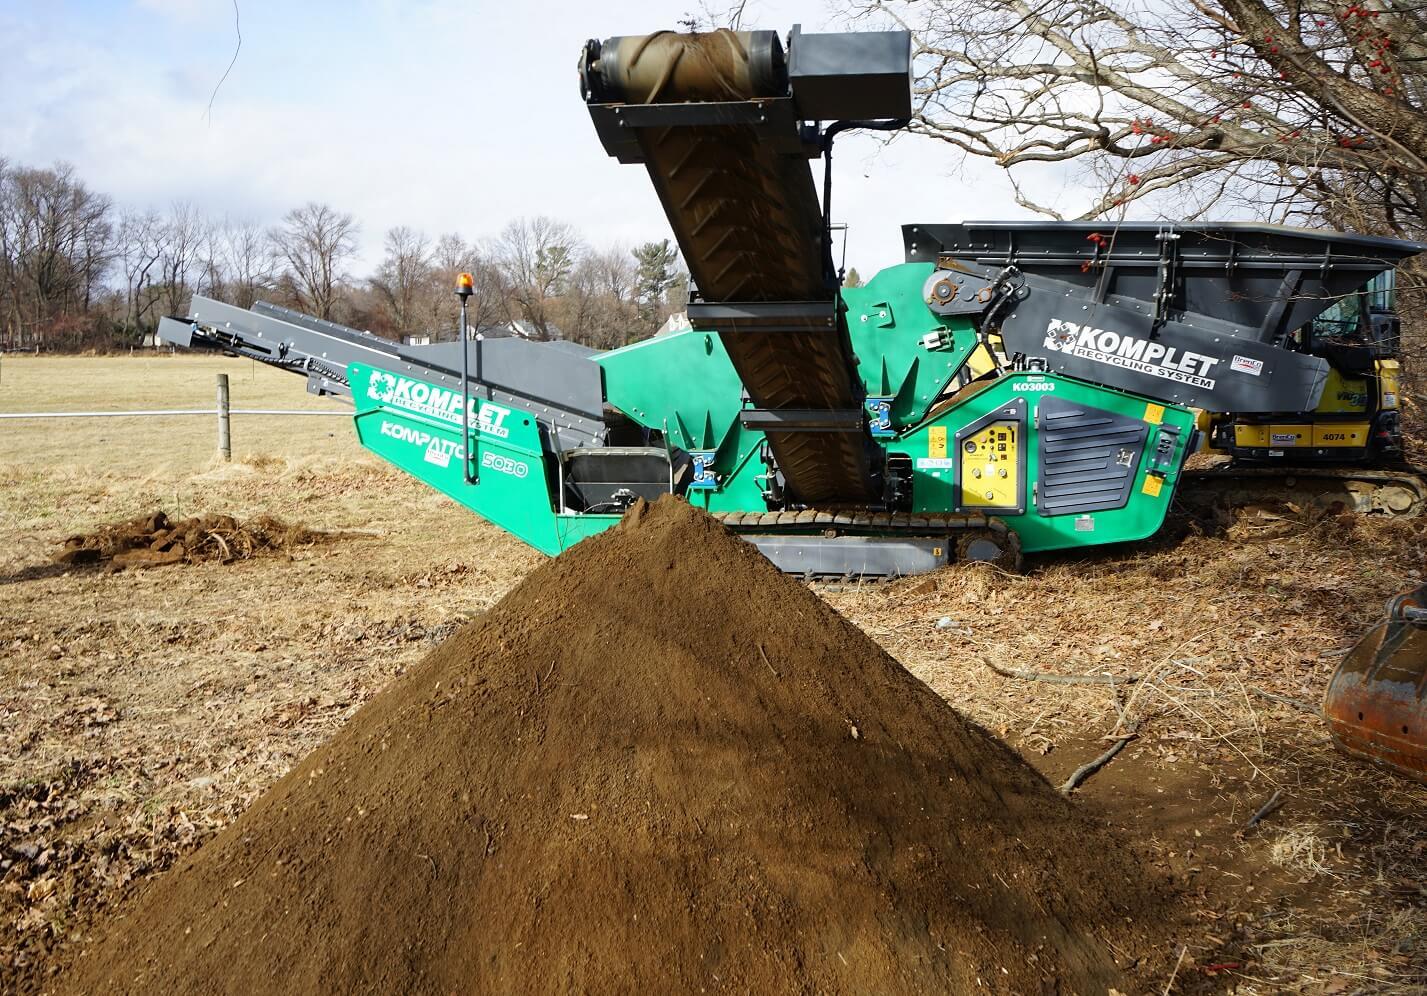 komplet-kompatto-5030-mobile-compact-screener-processing-topsoil-komplet-north-america